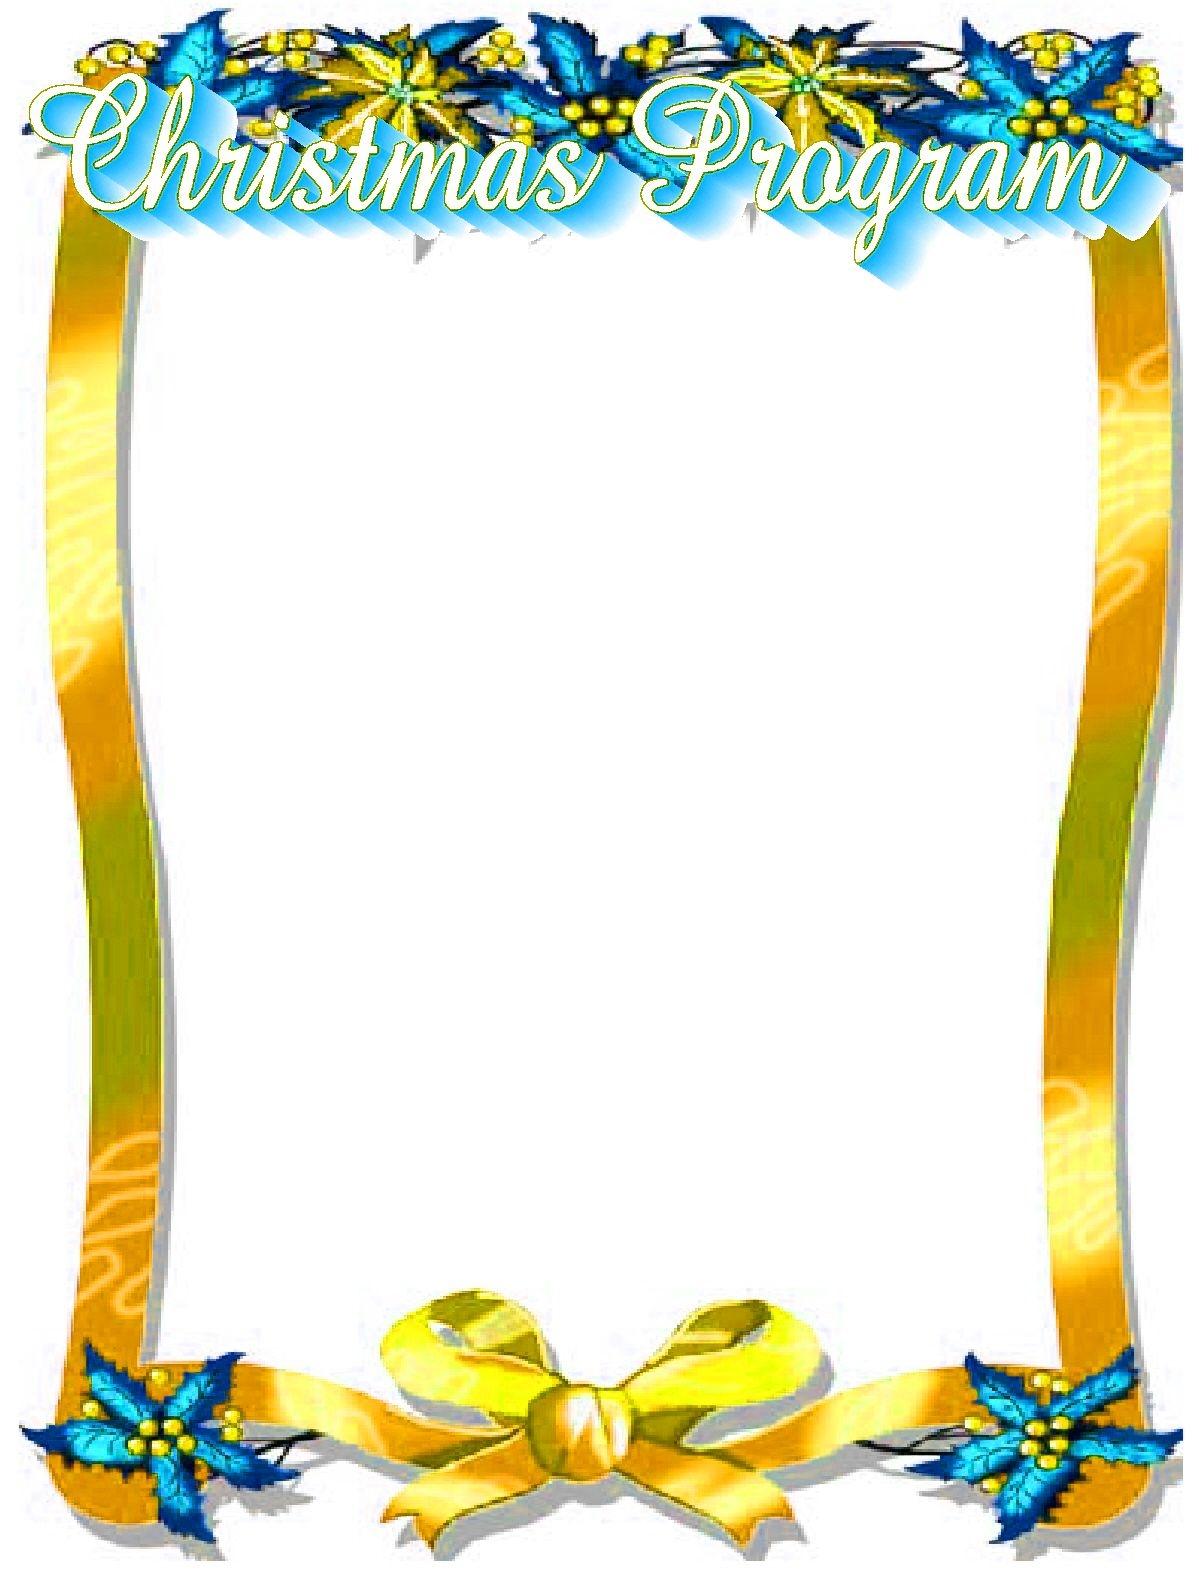 Religious Christmas Border Clipart.